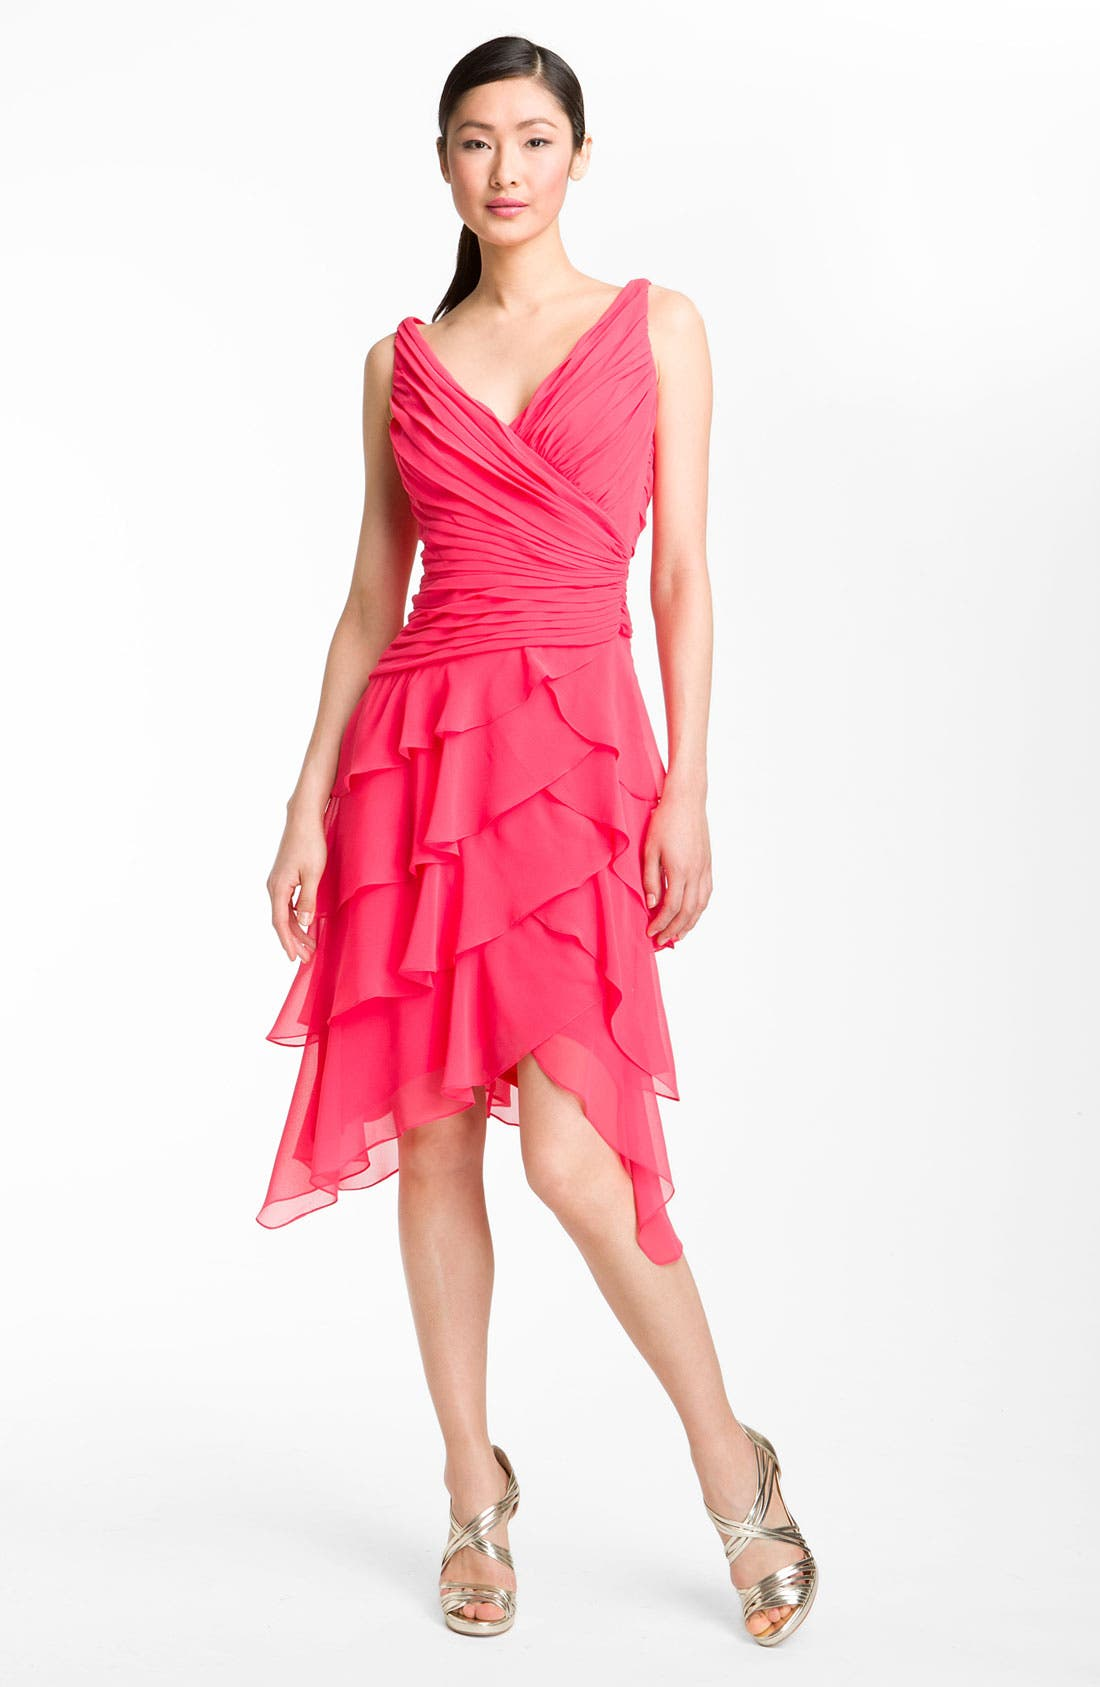 Alternate Image 1 Selected - T by Tadashi V-Neck Tiered Ruffle Skirt Chiffon Dress